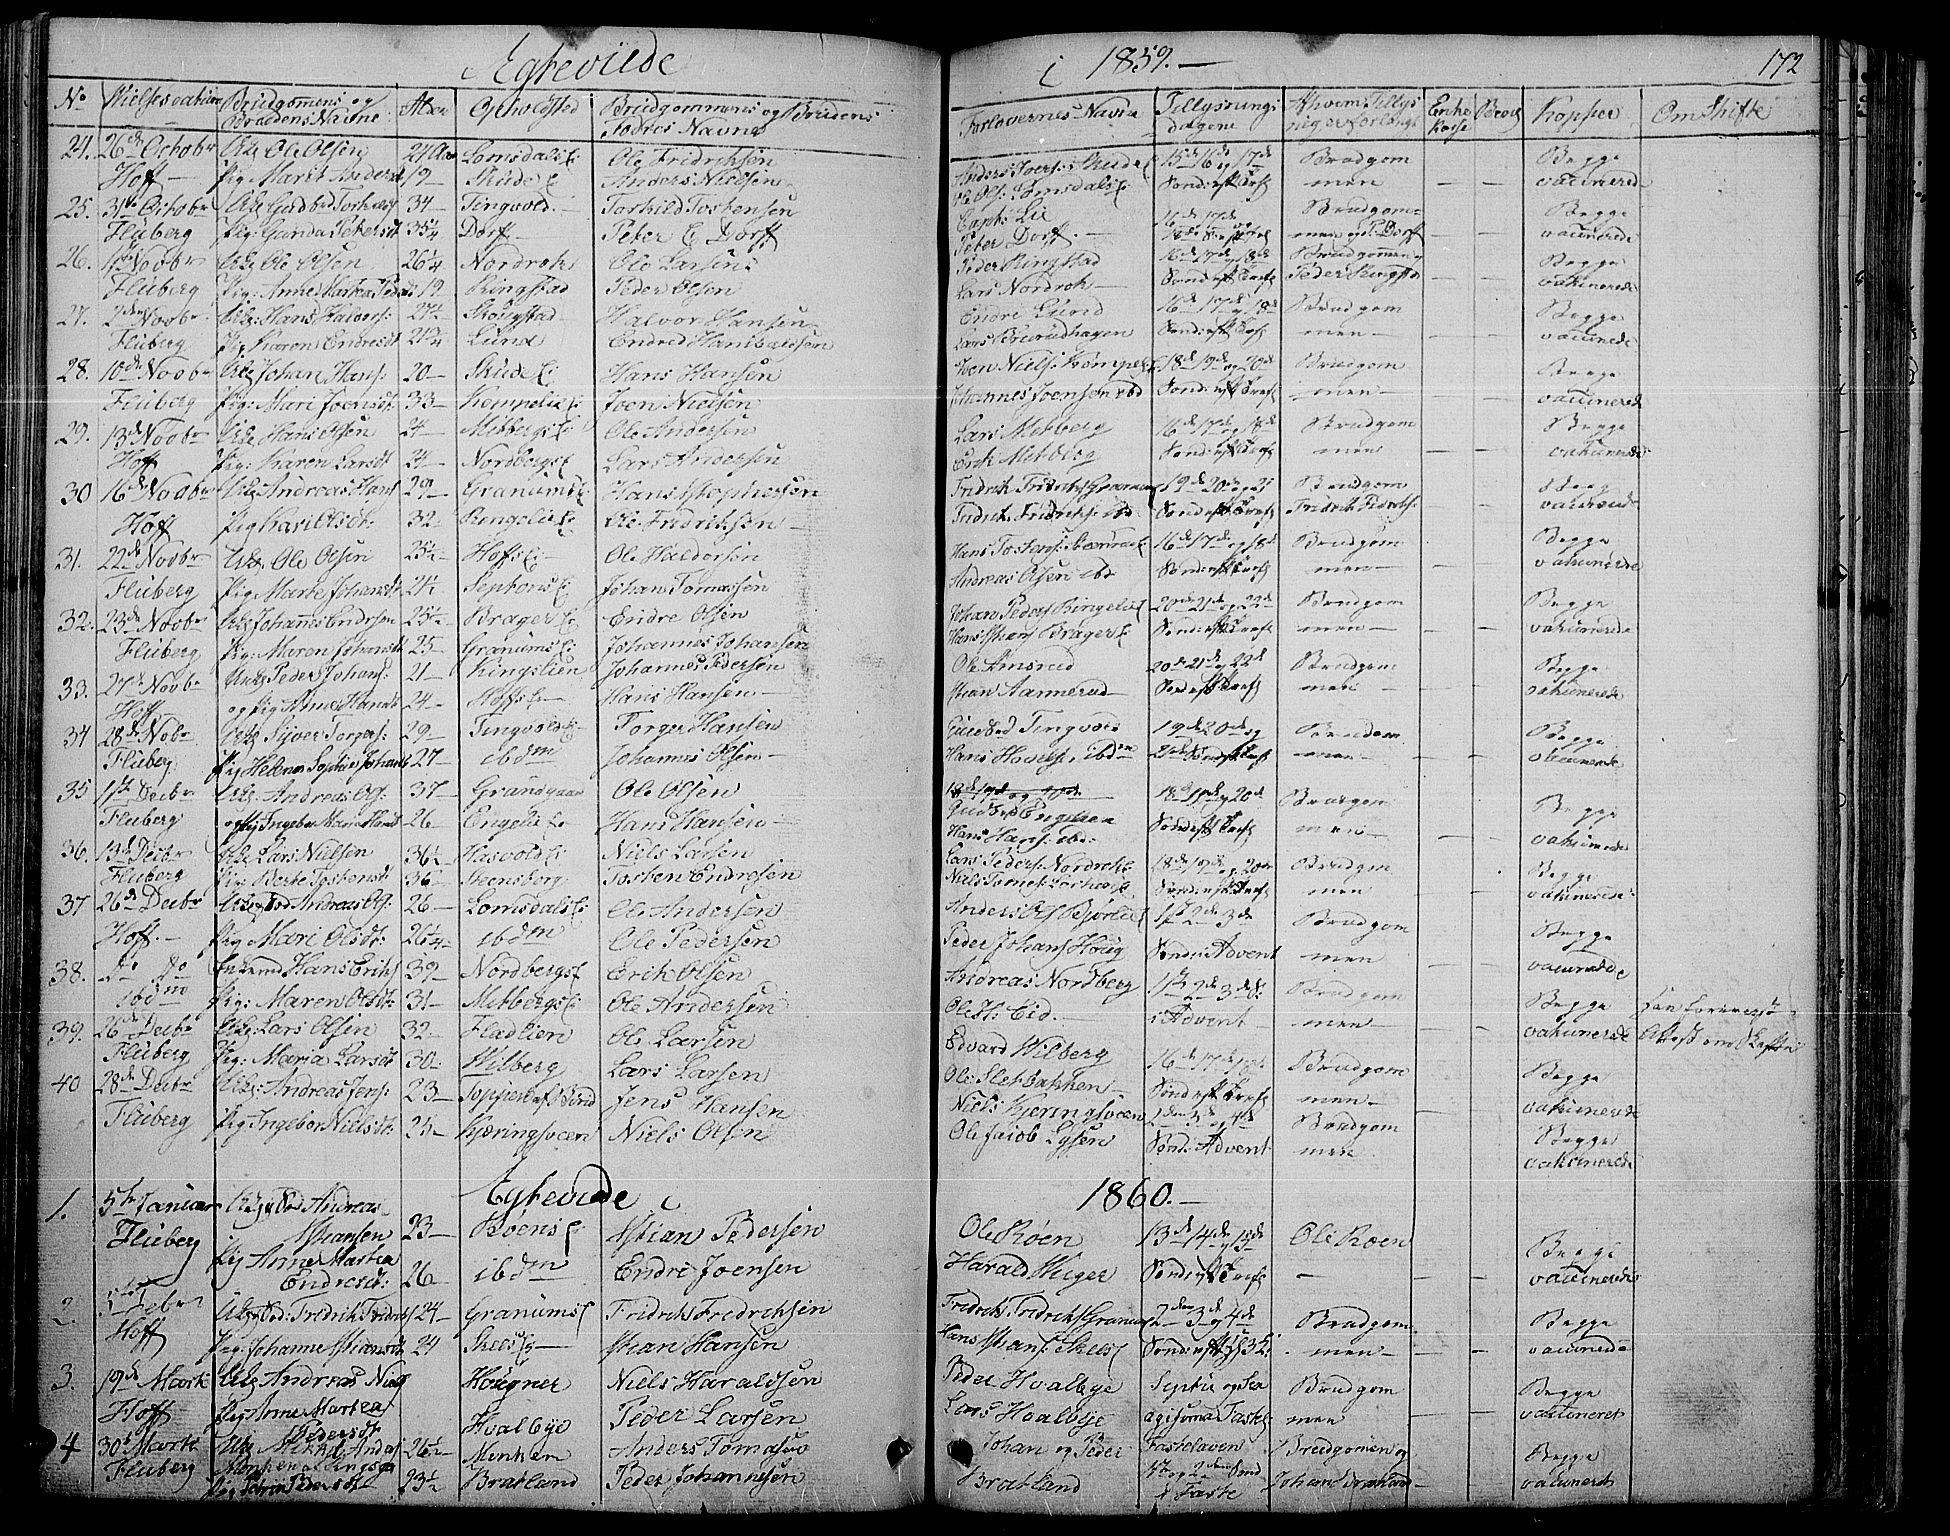 SAH, Søndre Land prestekontor, L/L0001: Klokkerbok nr. 1, 1849-1883, s. 172